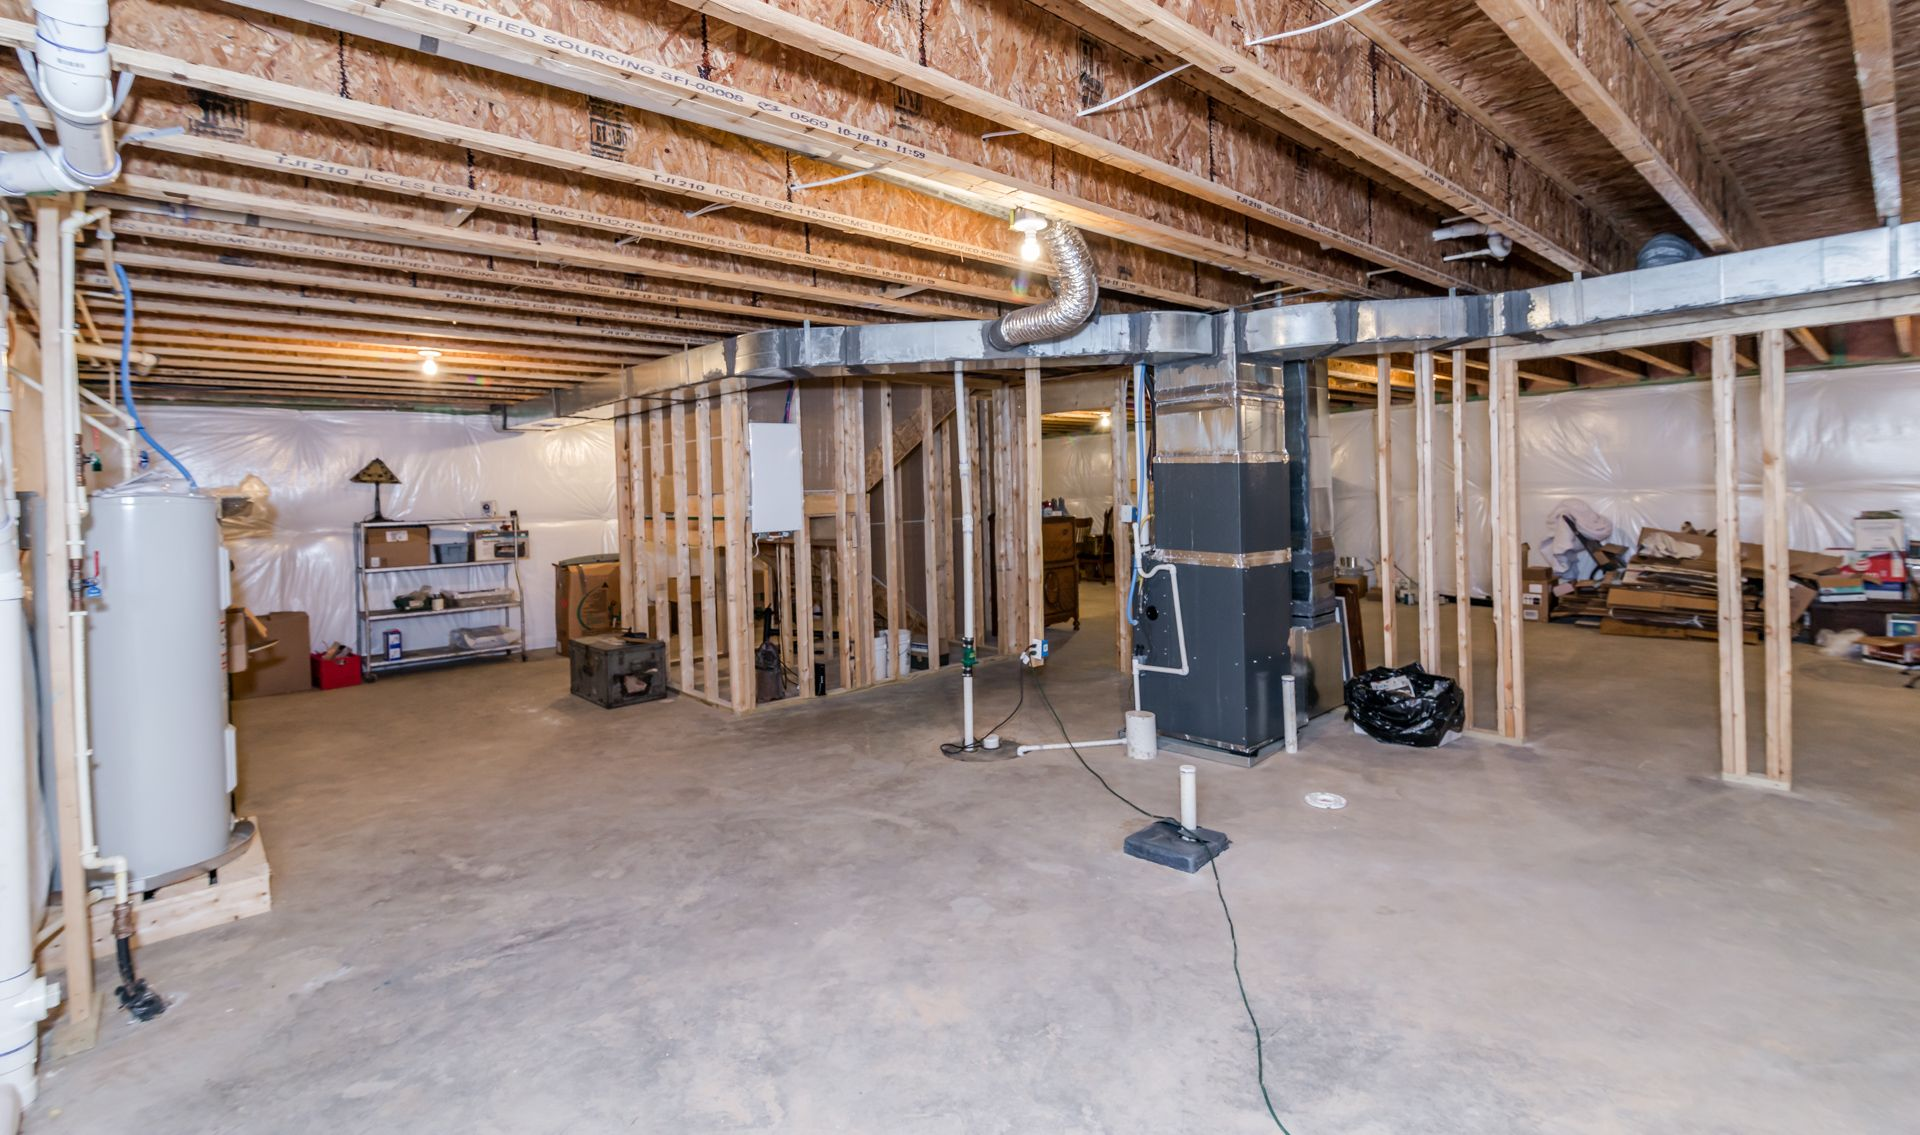 Ft Unfinished Basement Plumbed For Bathroom & Wet Bar Great